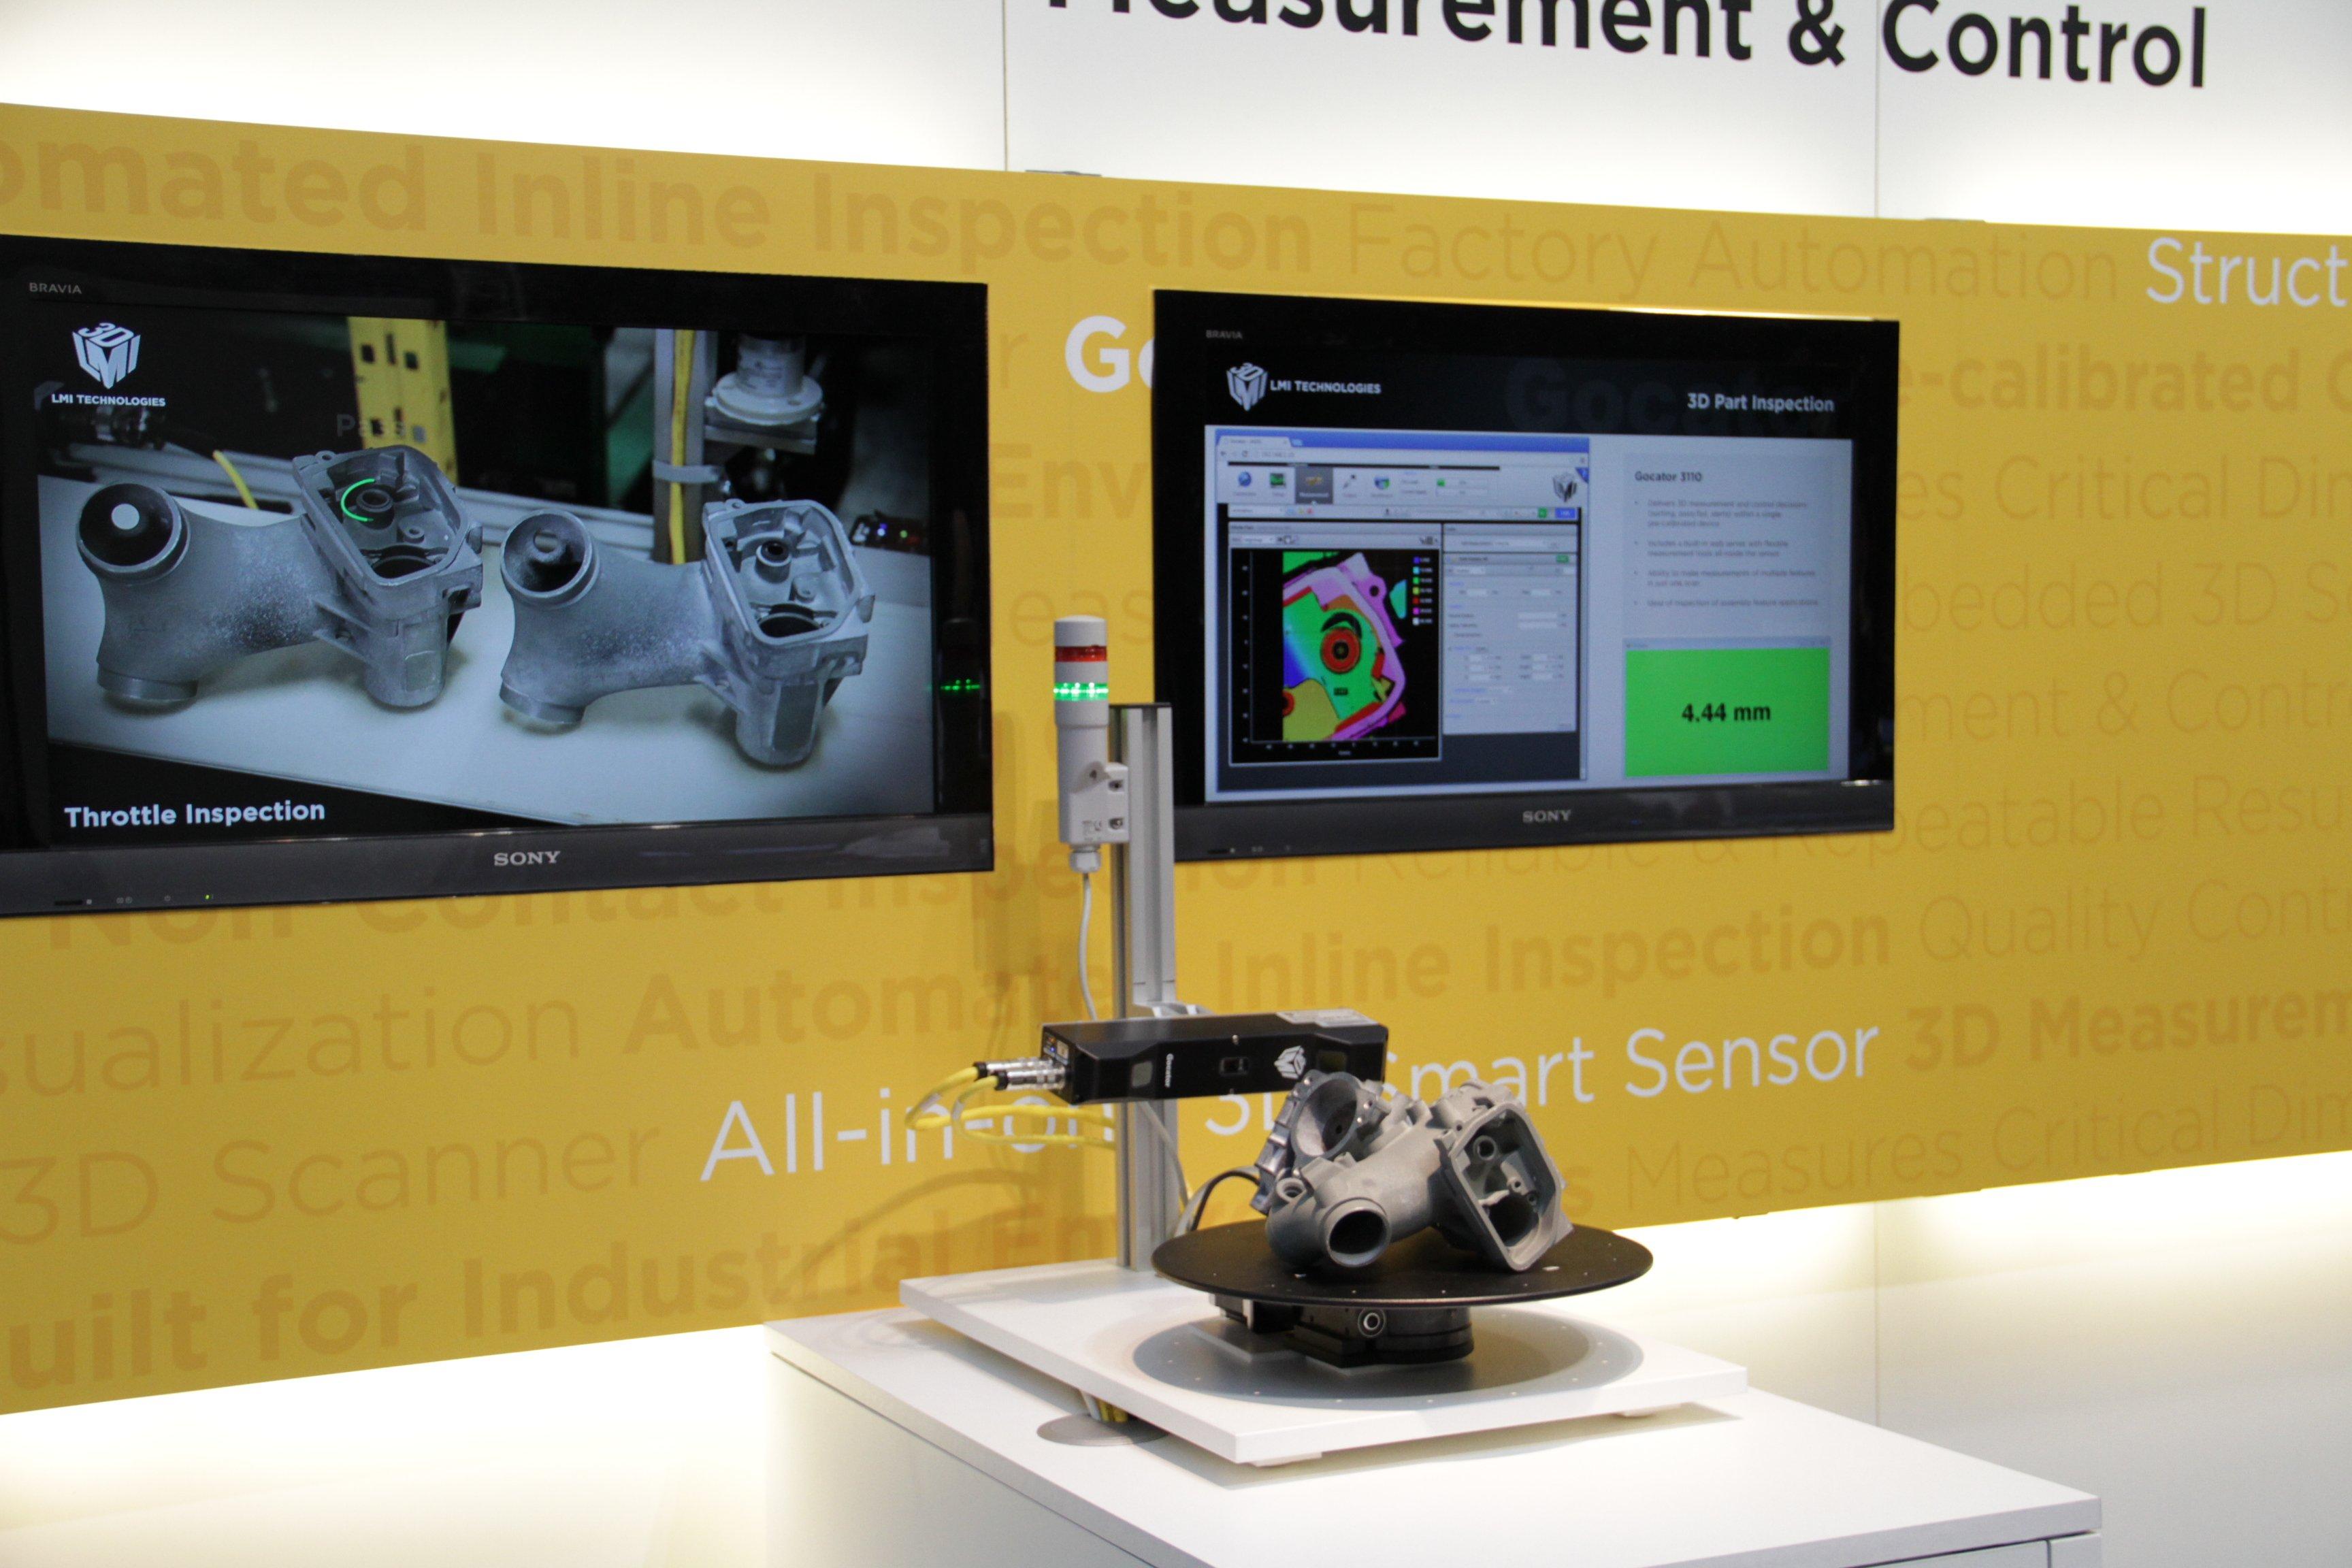 Gocator 3110 3D smart sensor